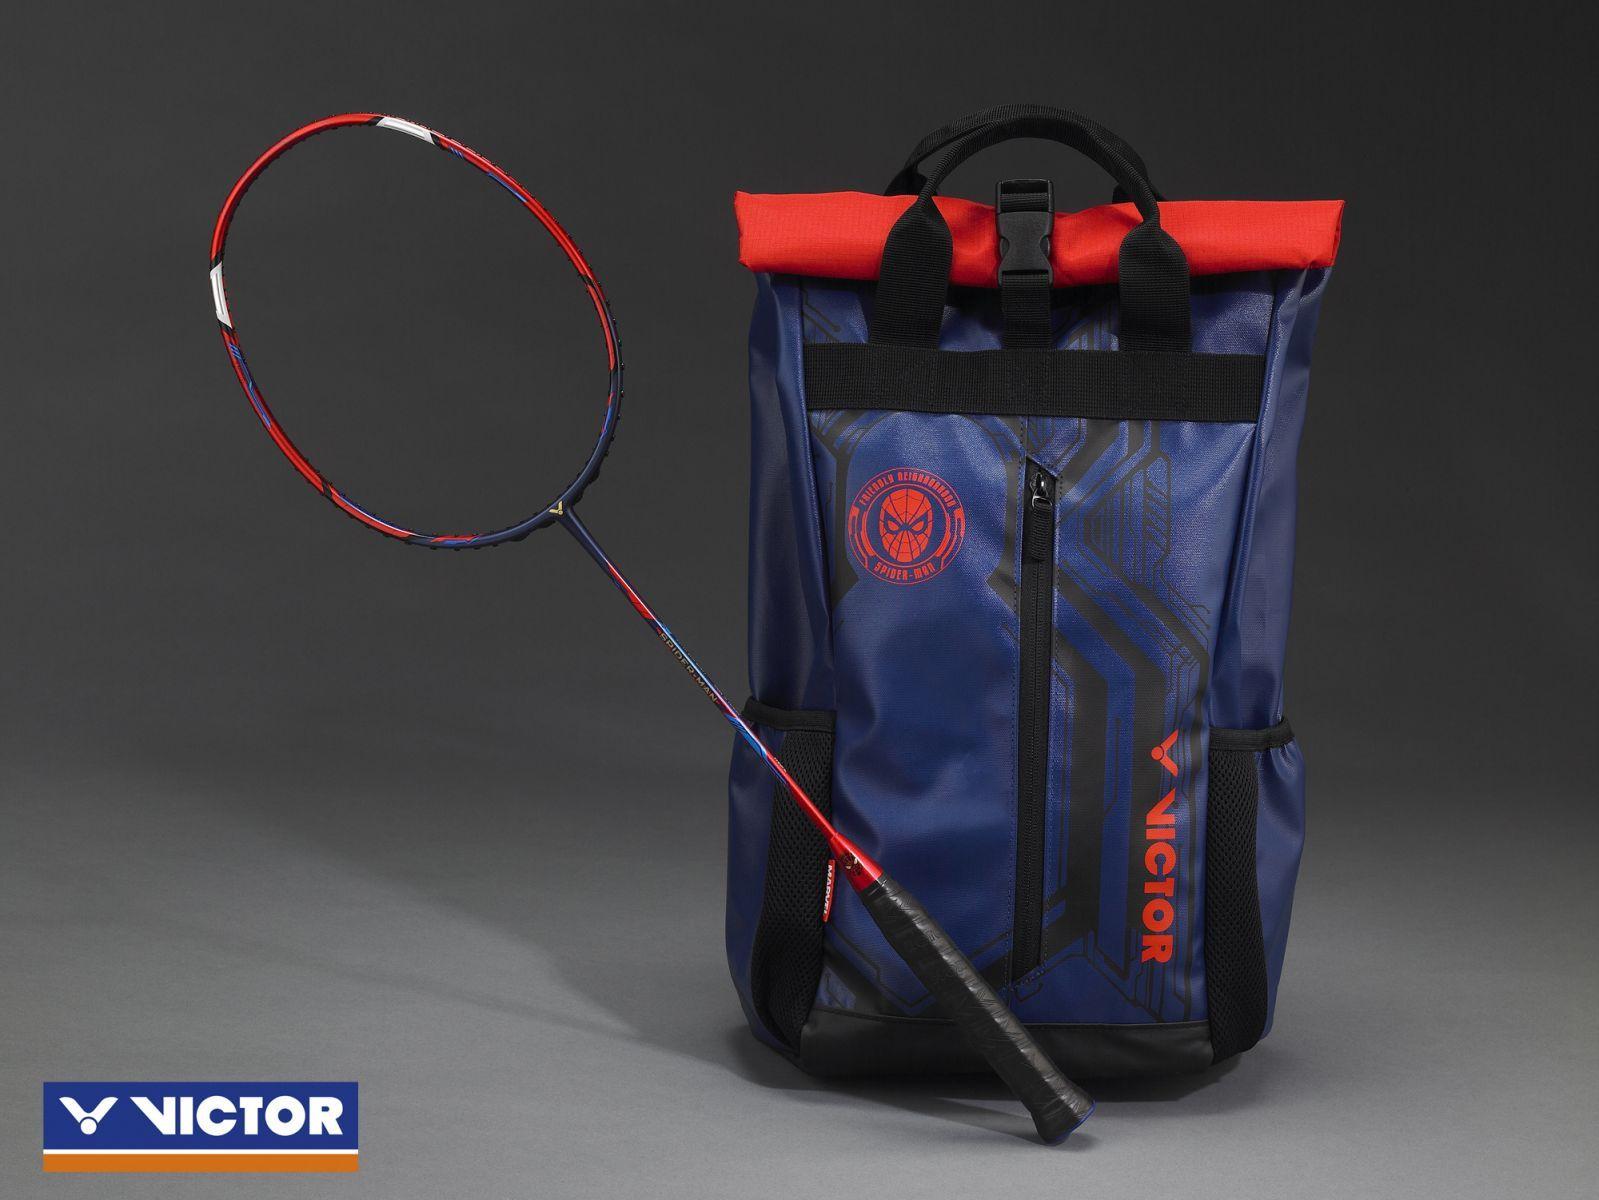 VICTOR蜘蛛人系列套組 全球限量上市 | VICTOR 勝利體育│台灣羽球第一品牌